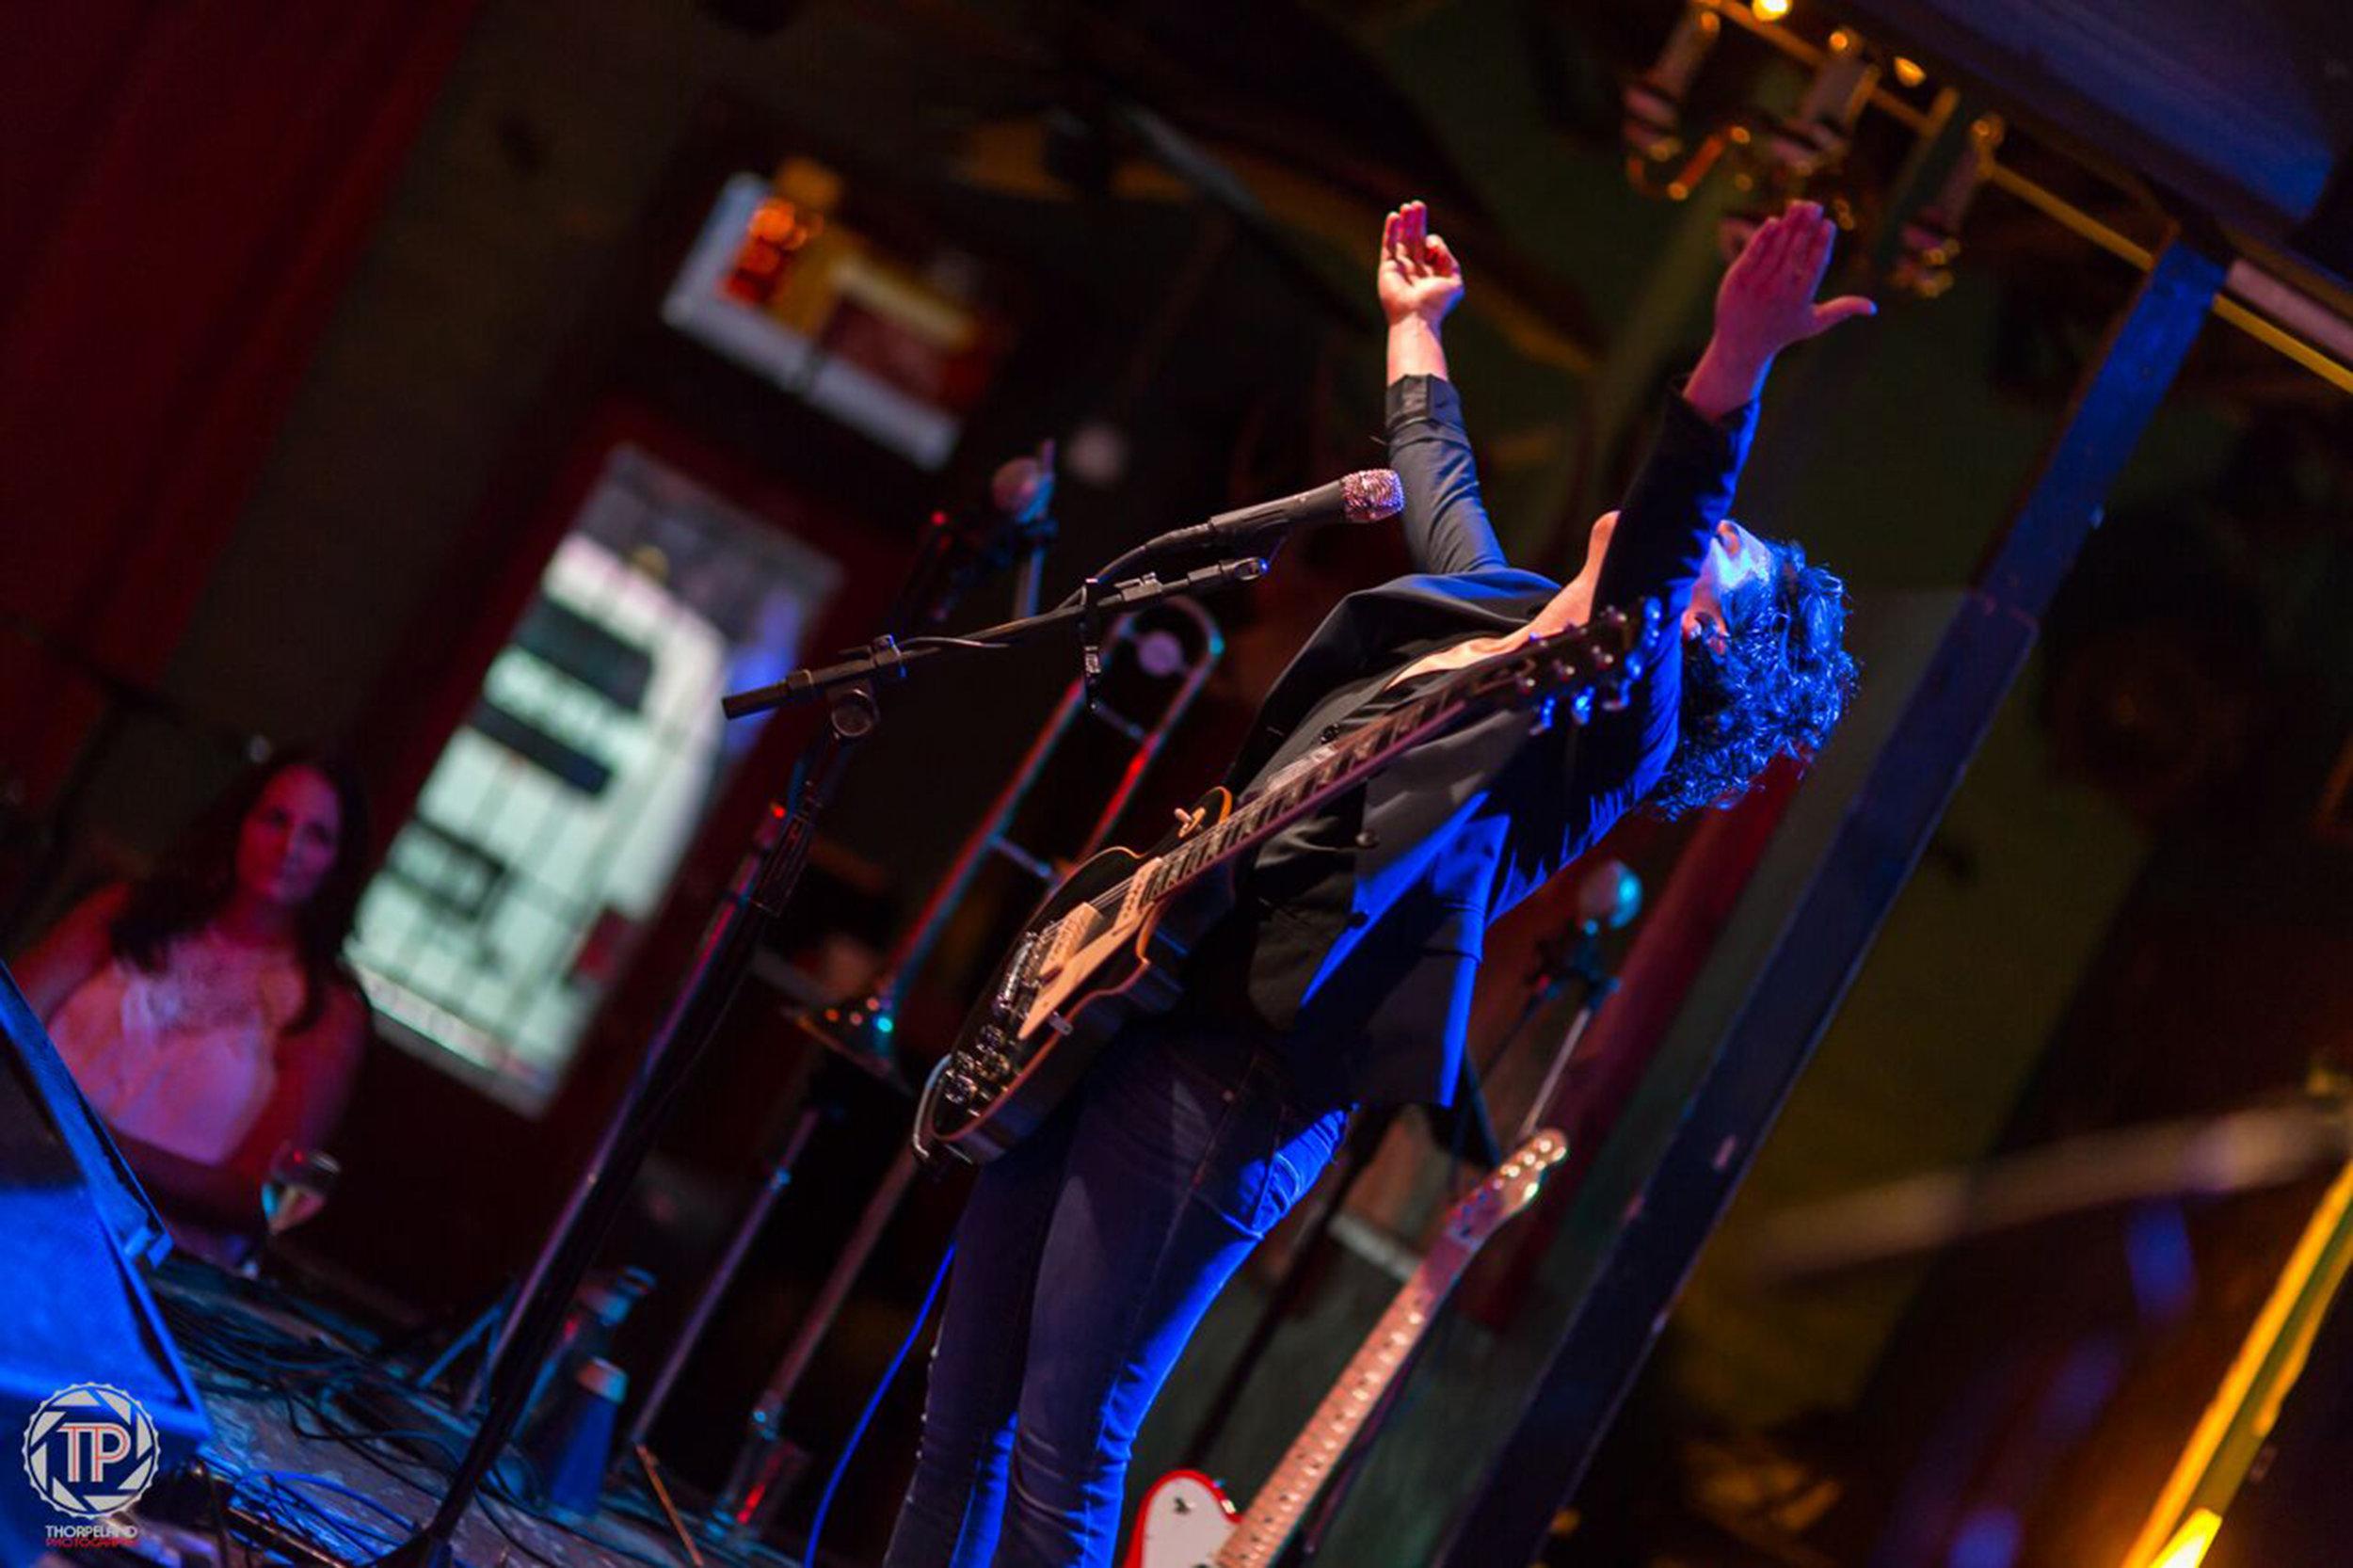 Bat-Or Kalo of the band KALO plays at Dan's Silver Leaf in Denton, Texas